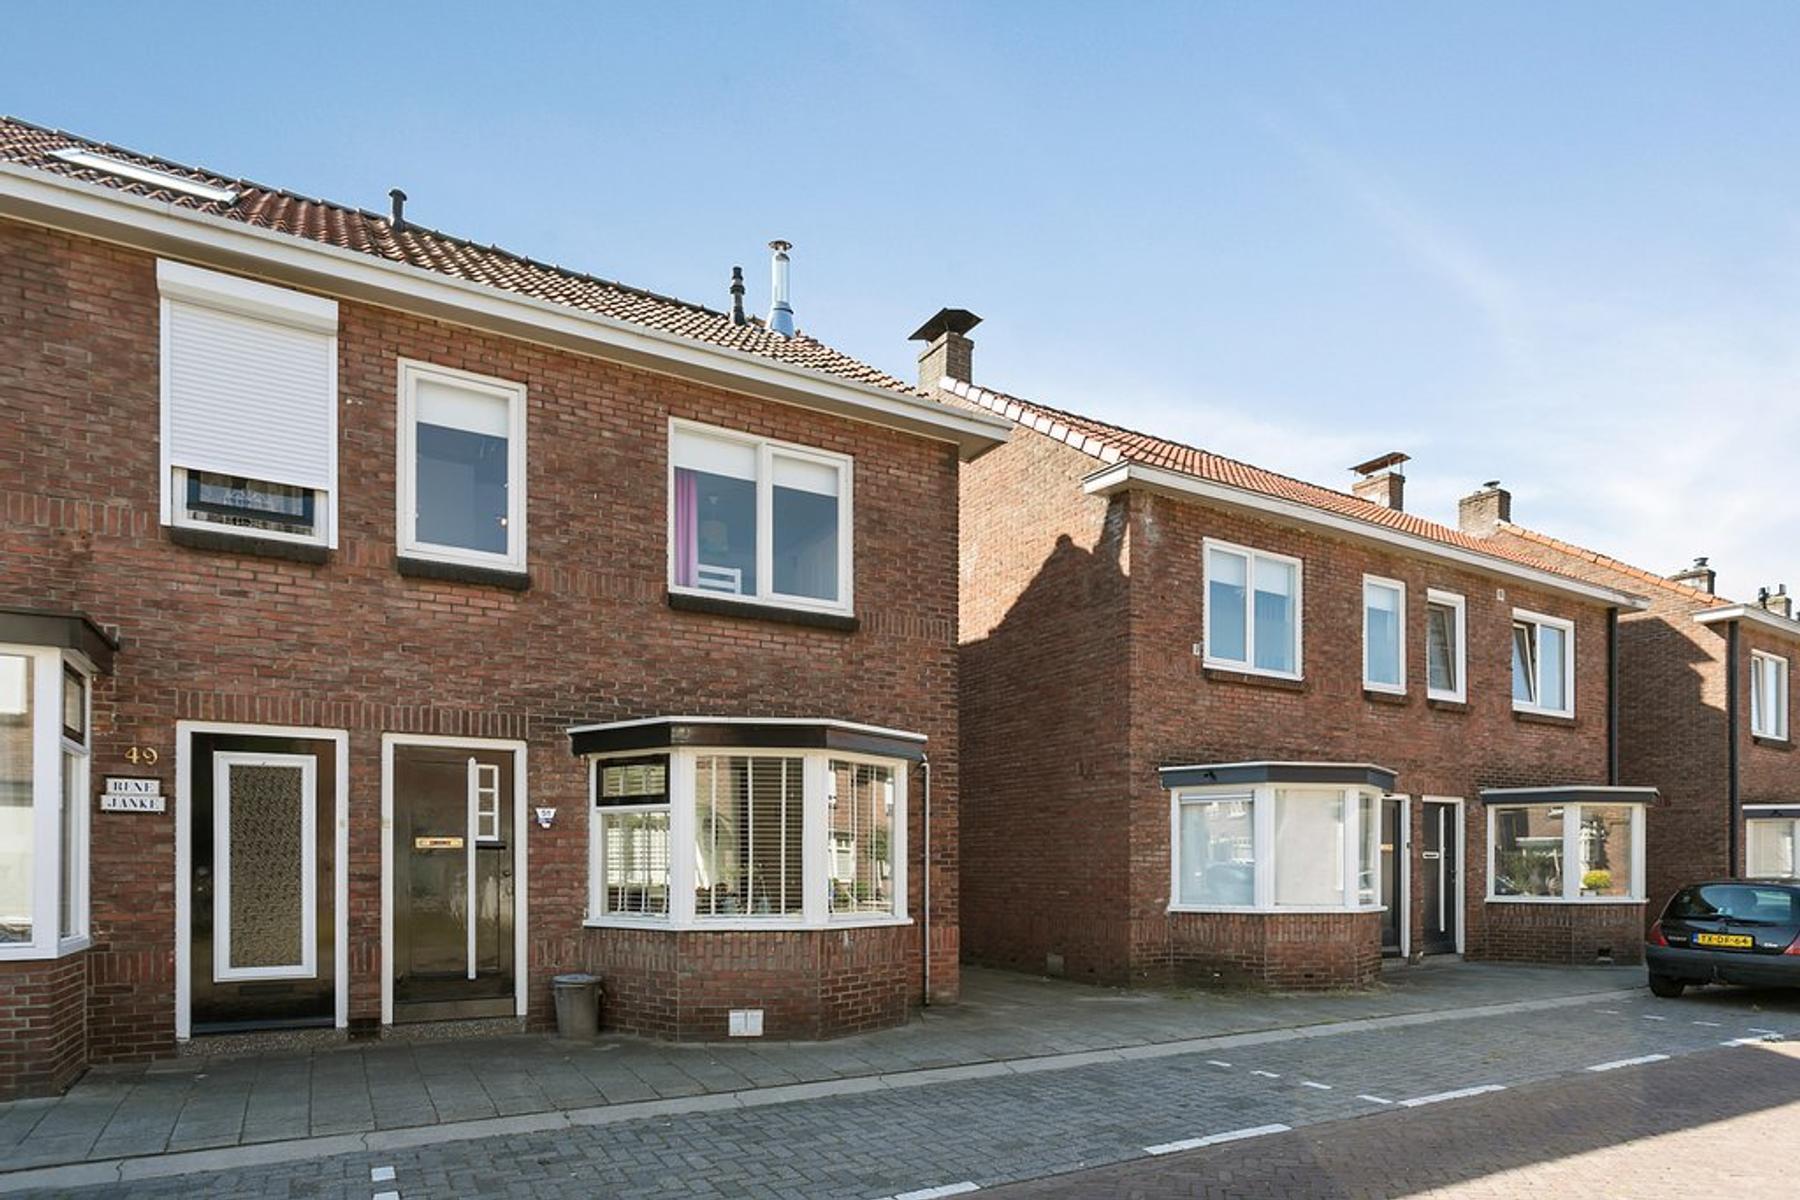 Eikstraat 51 in Enschede 7545 JB